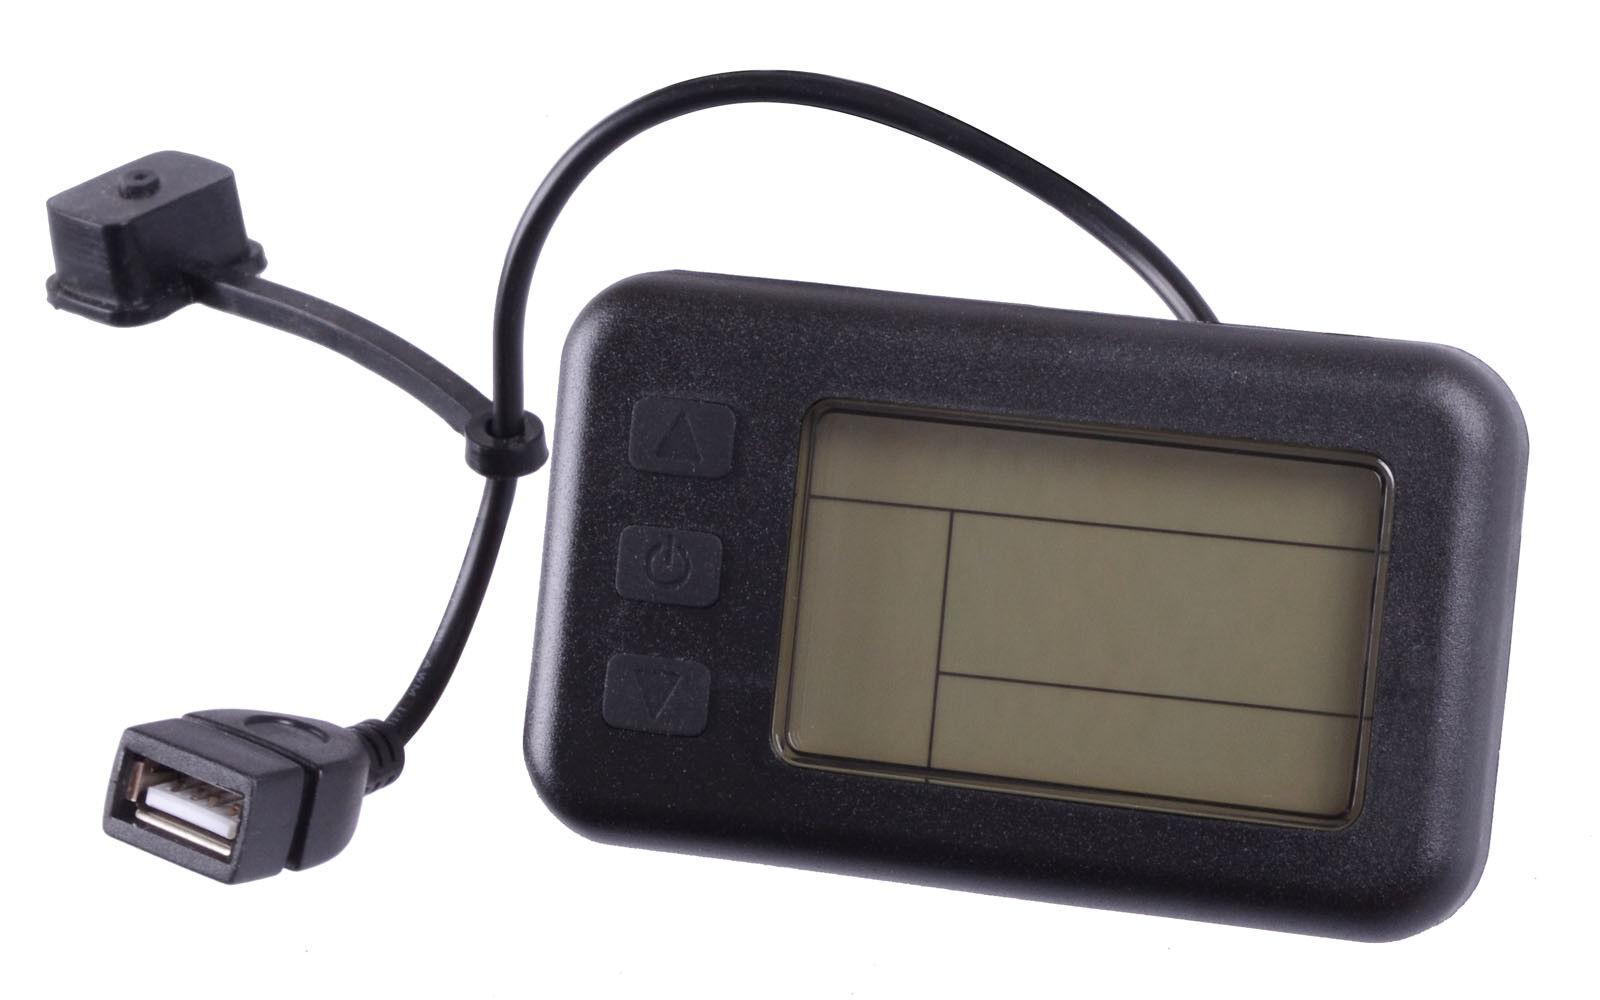 KT-LCD1 Display 24V   36V mit USB Ladebuchse für Pedelec, Elektrofahrrad, E-Bike